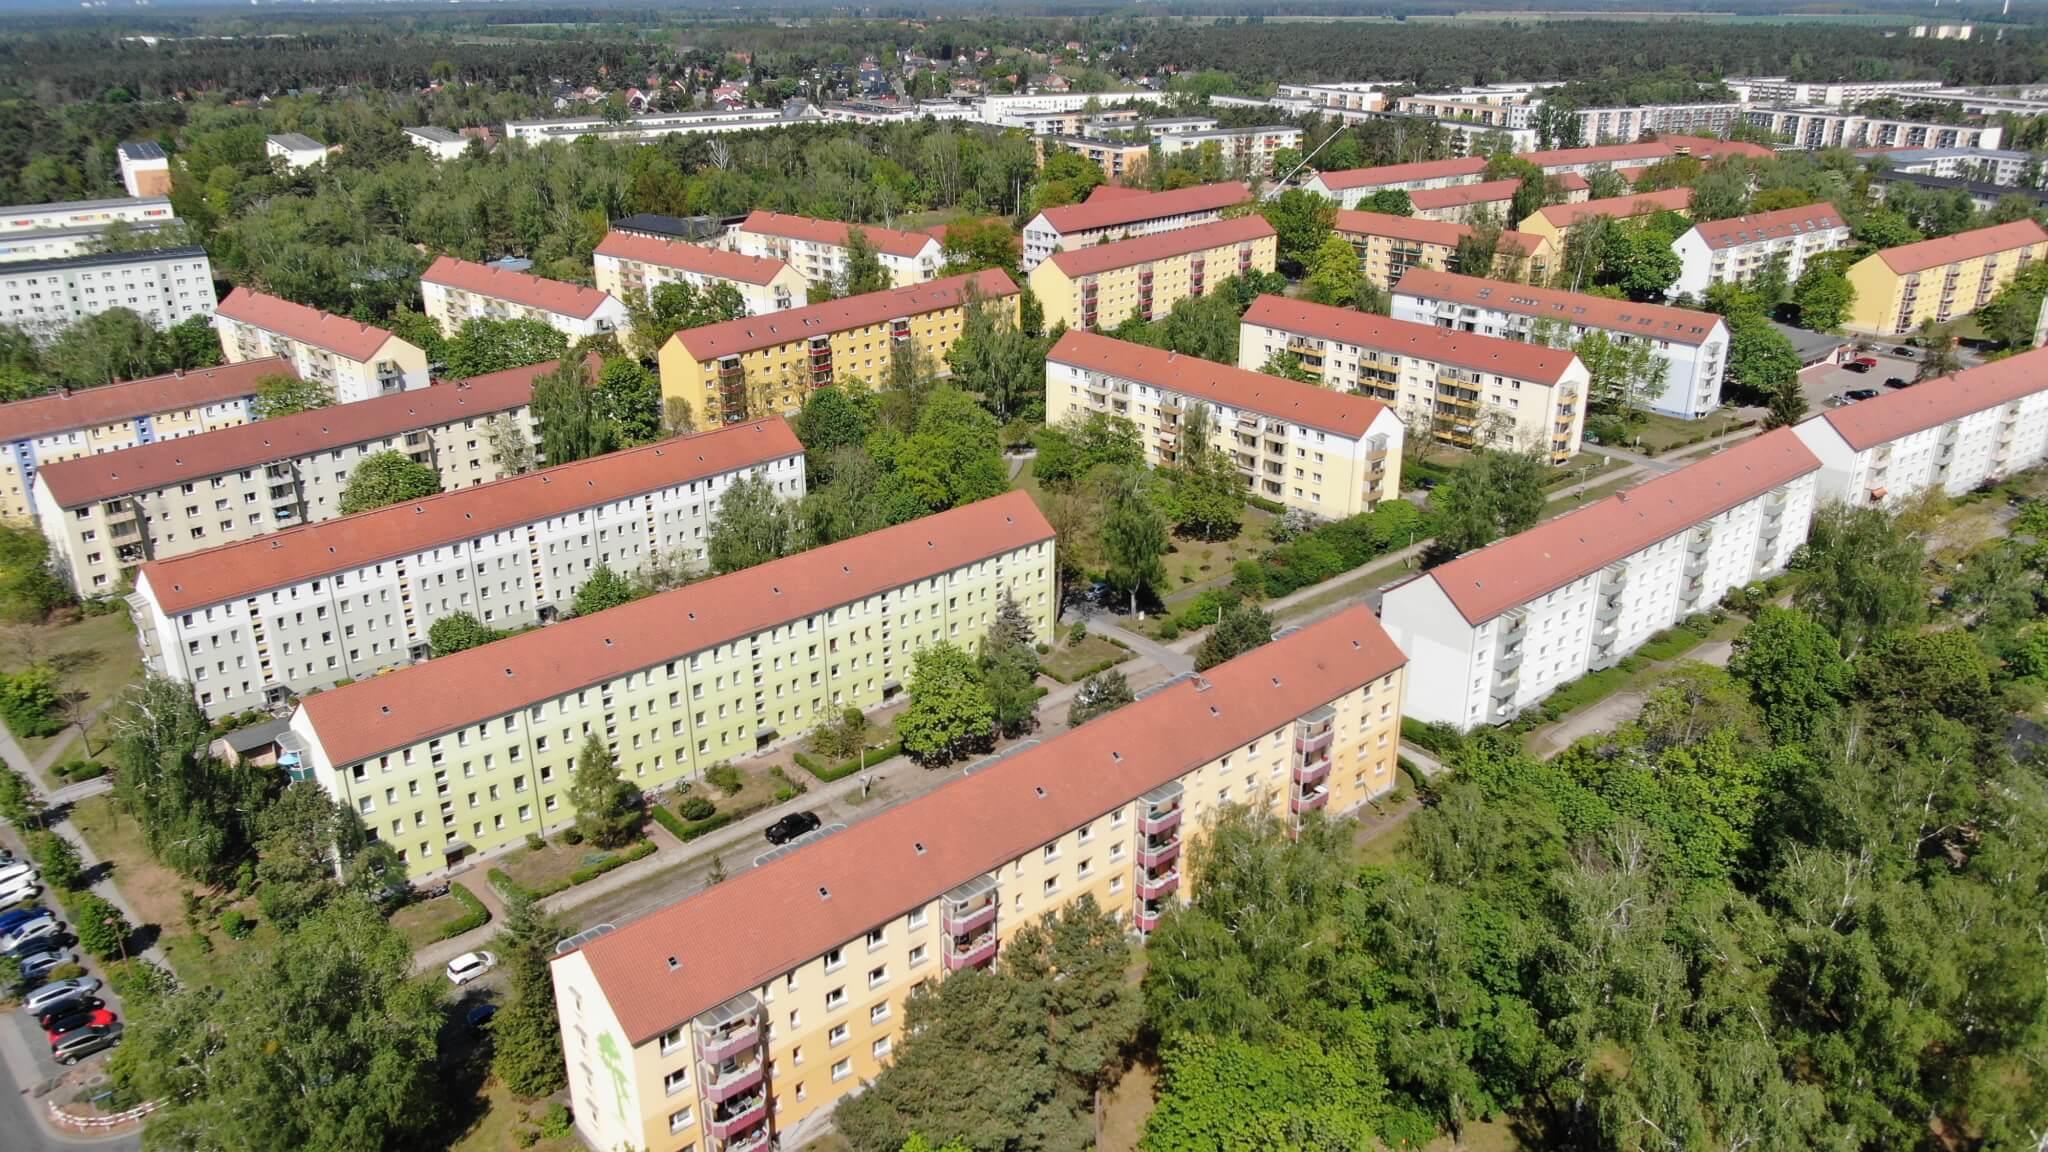 Luftbild Ludwigsfelde West